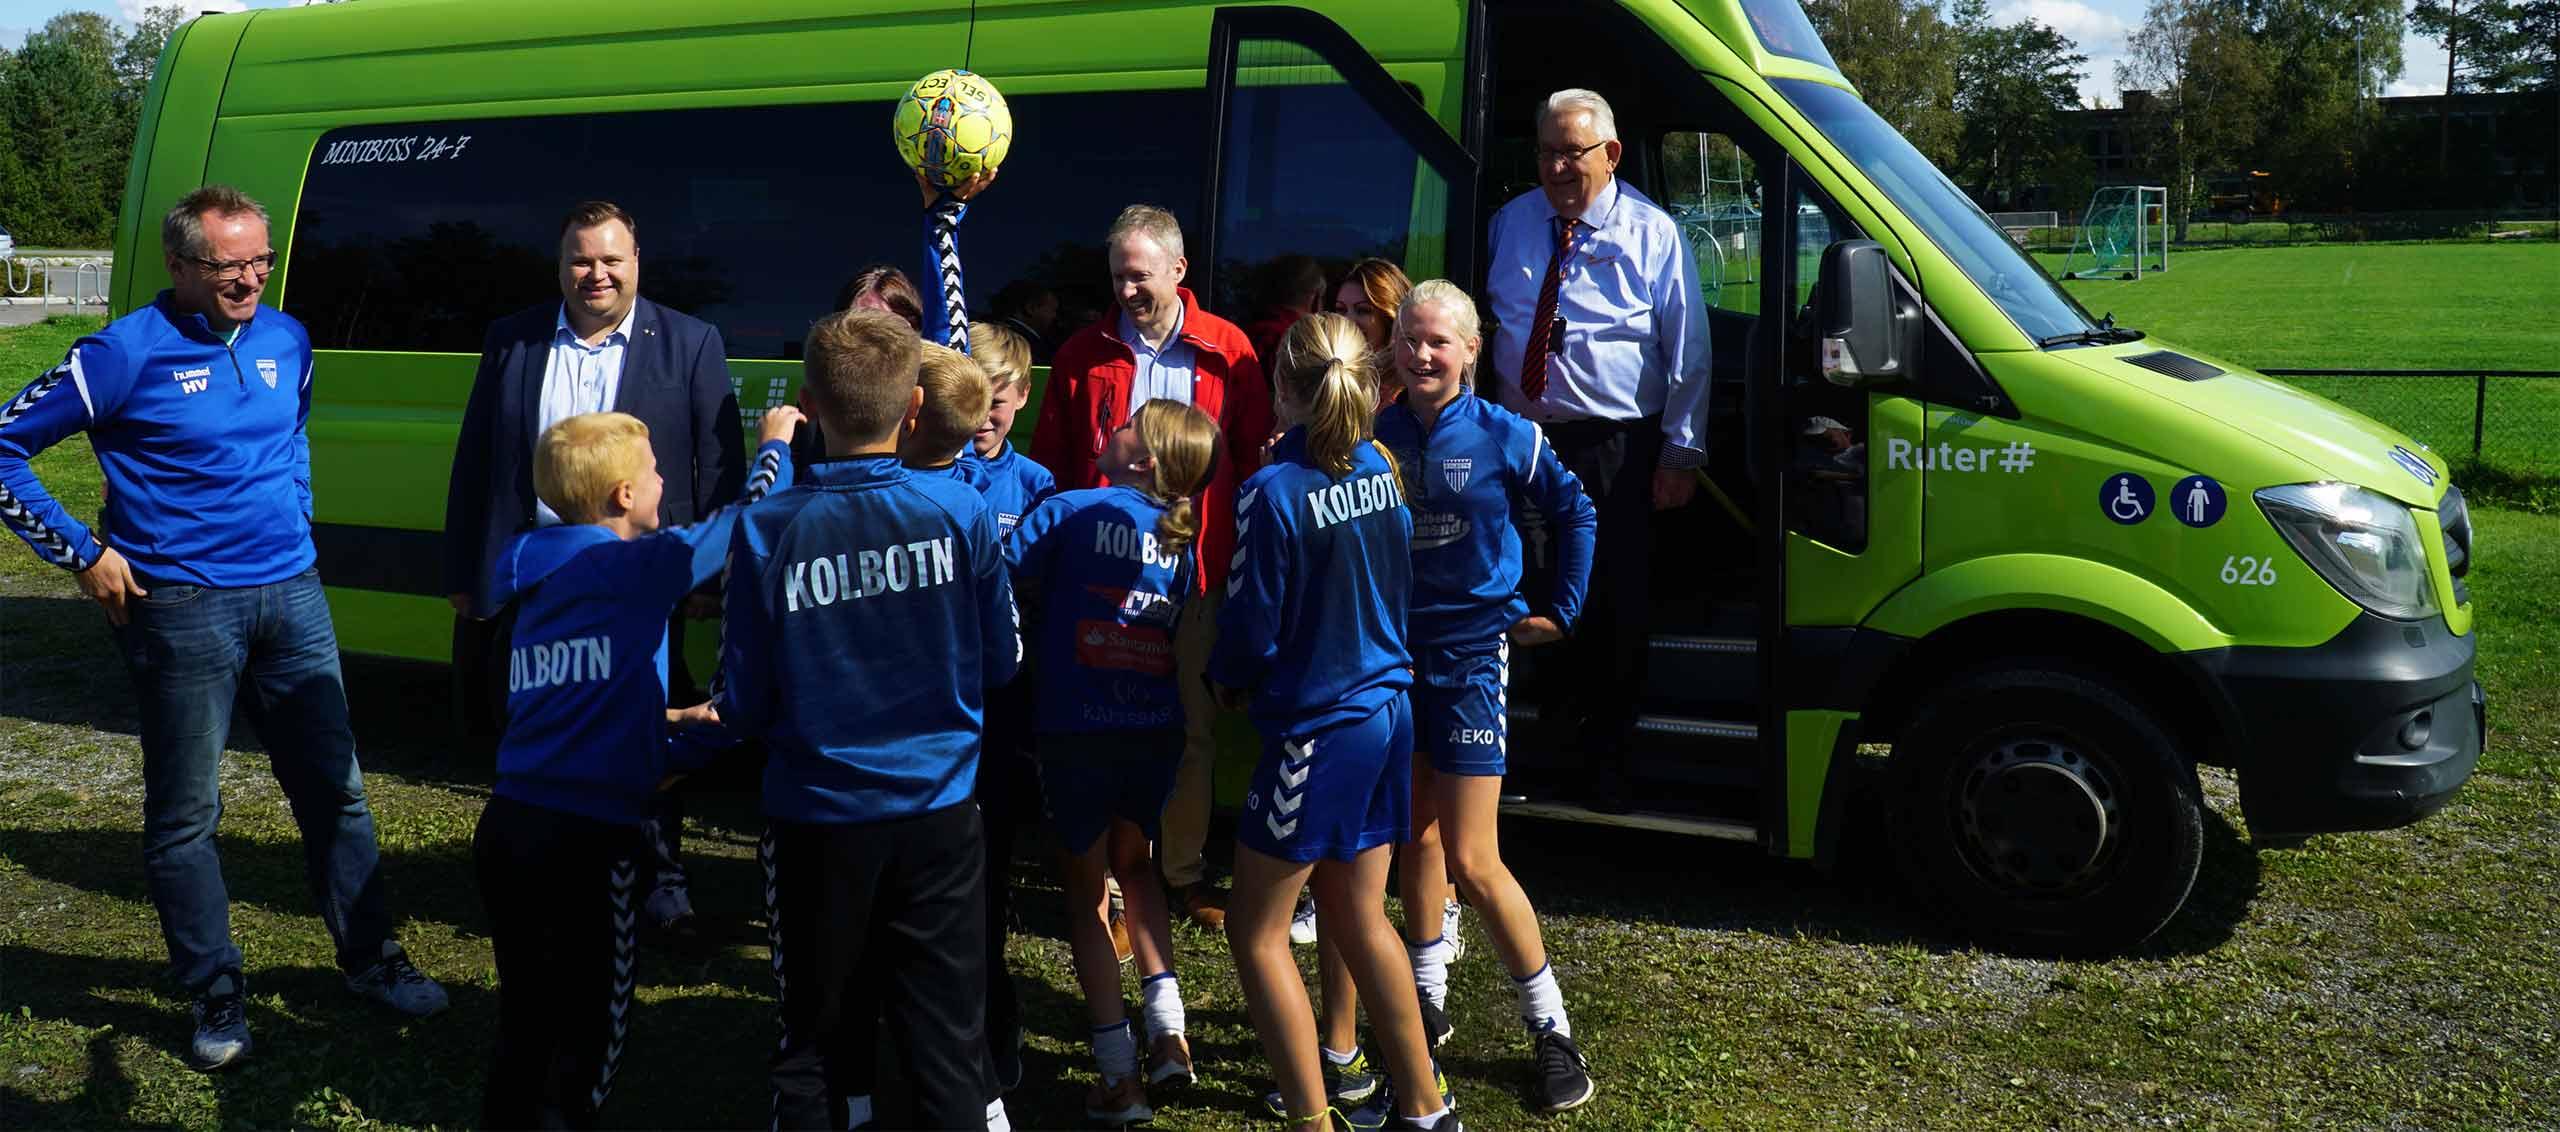 Bilde av barn foran aktivitetsbussen